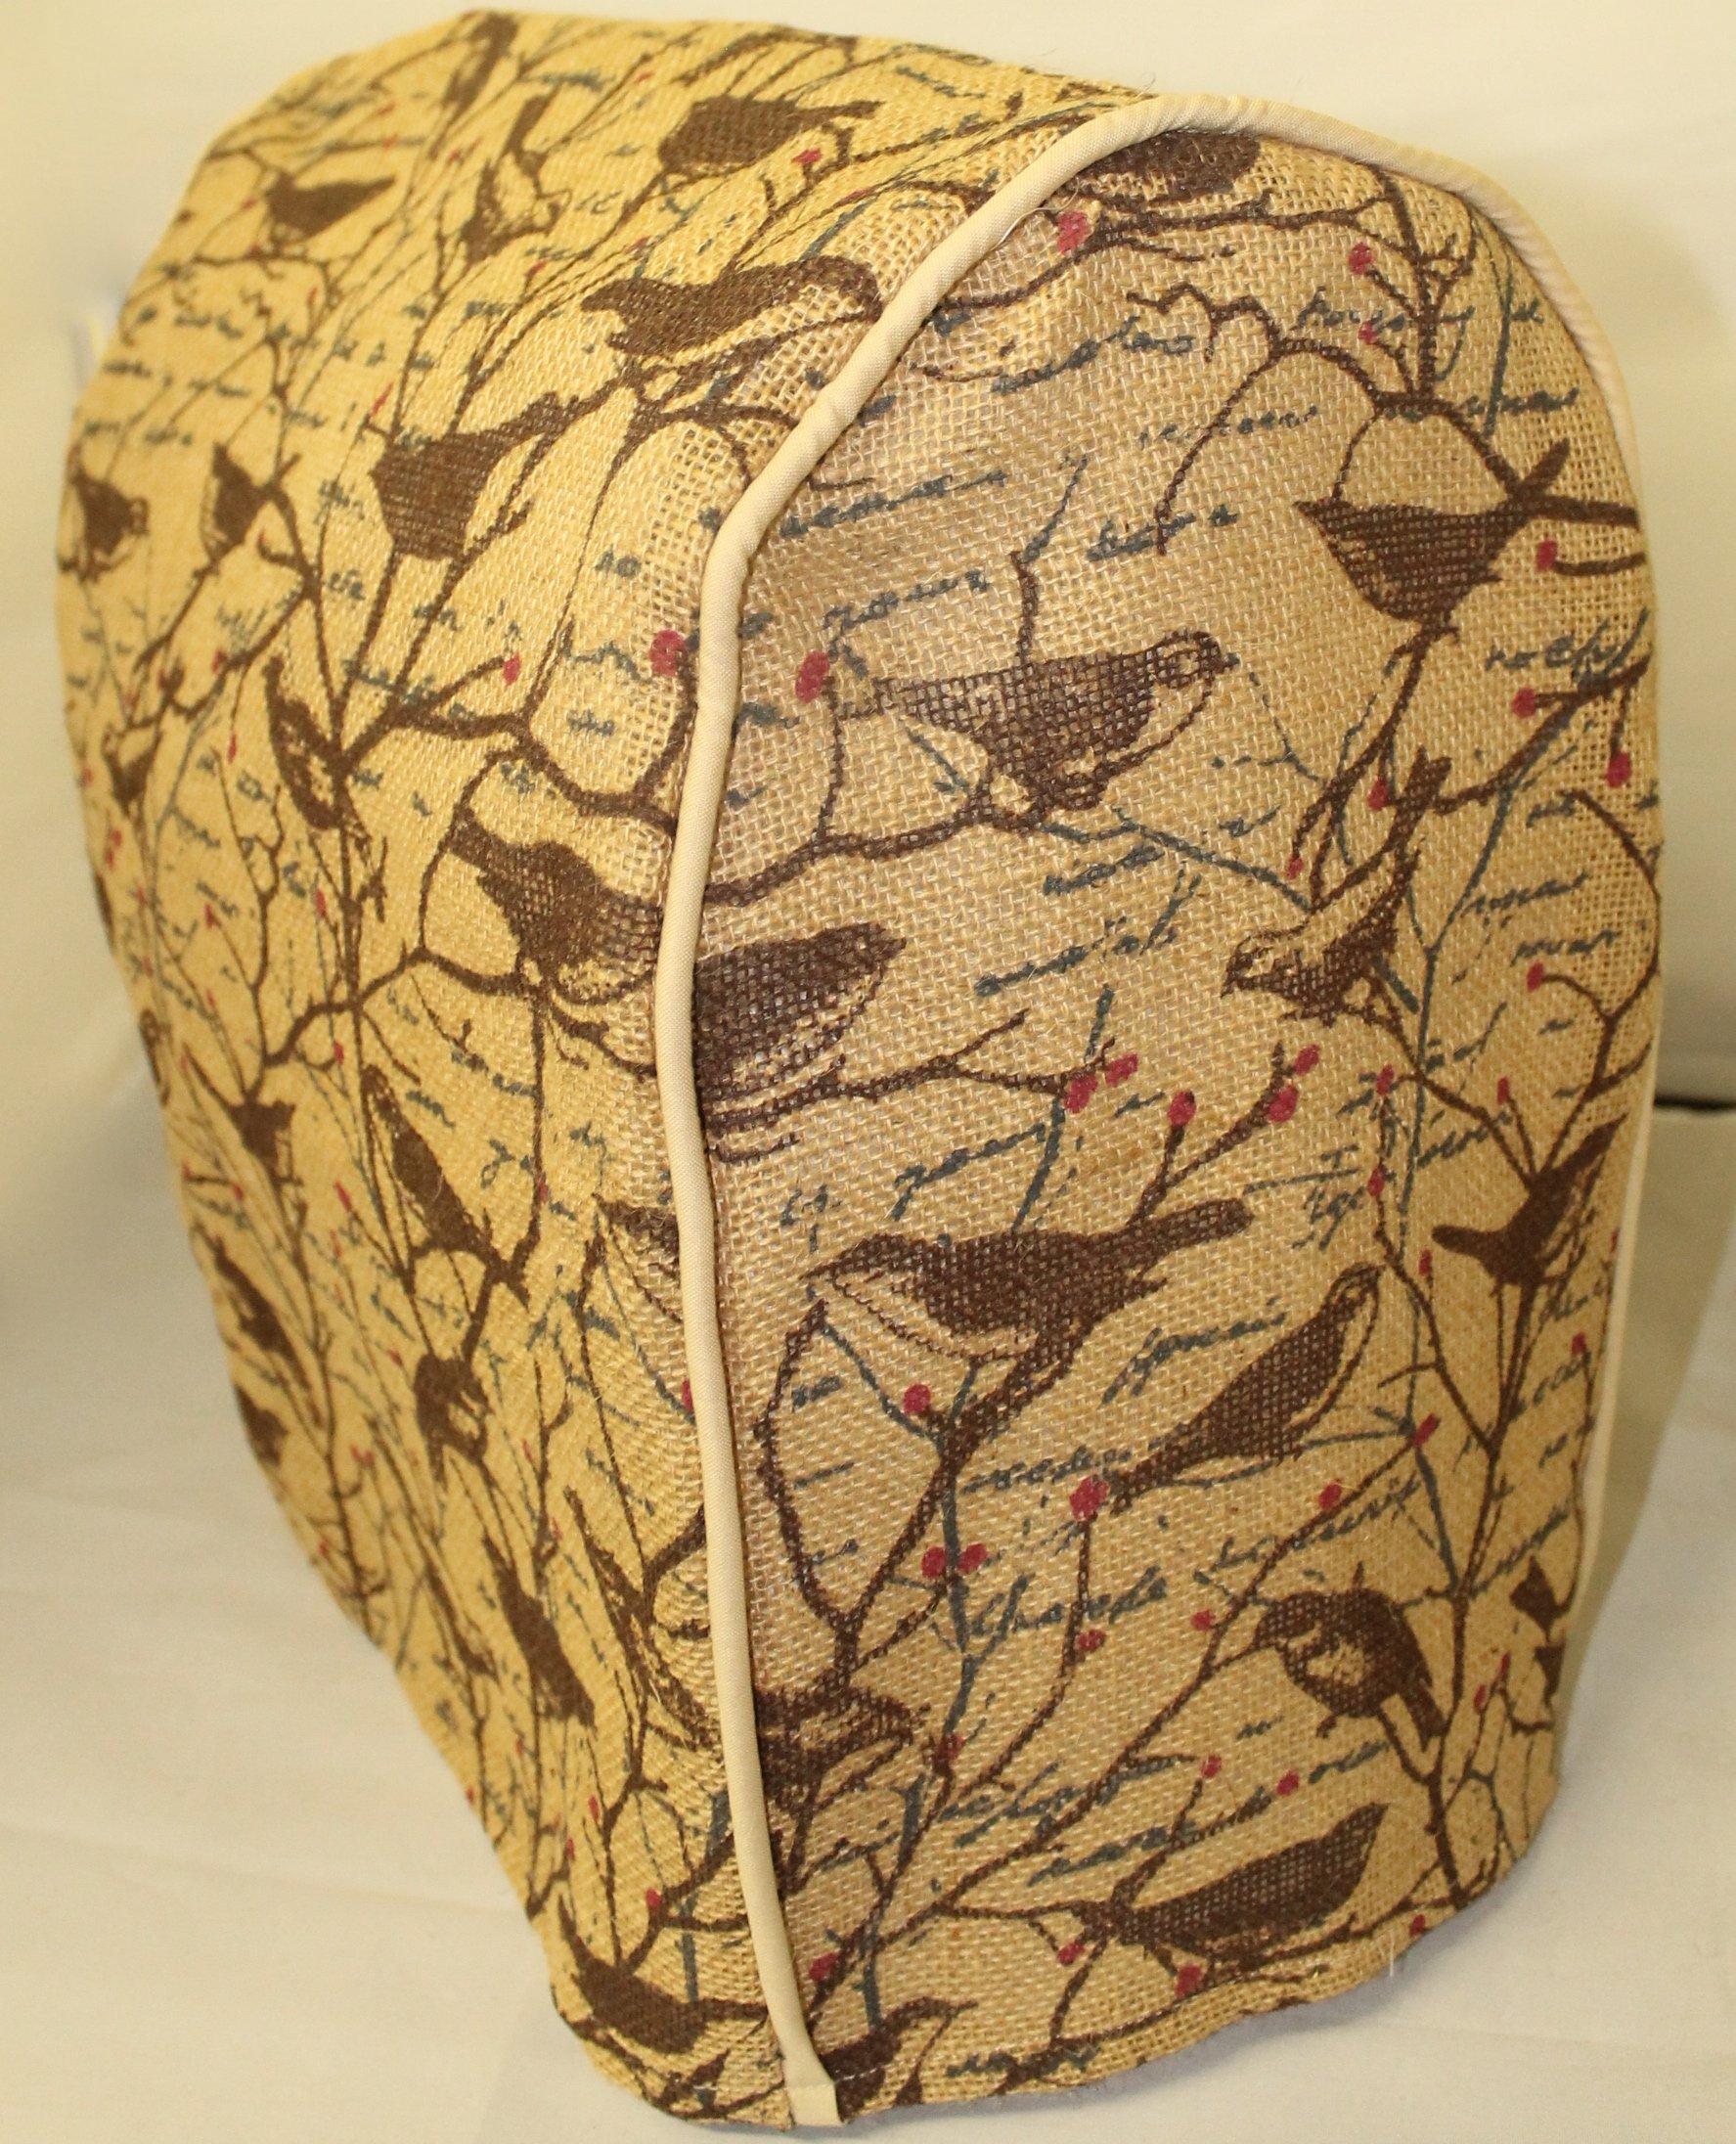 Tilt Head KitchenAid Cover, Burlap/Bark and Swallow